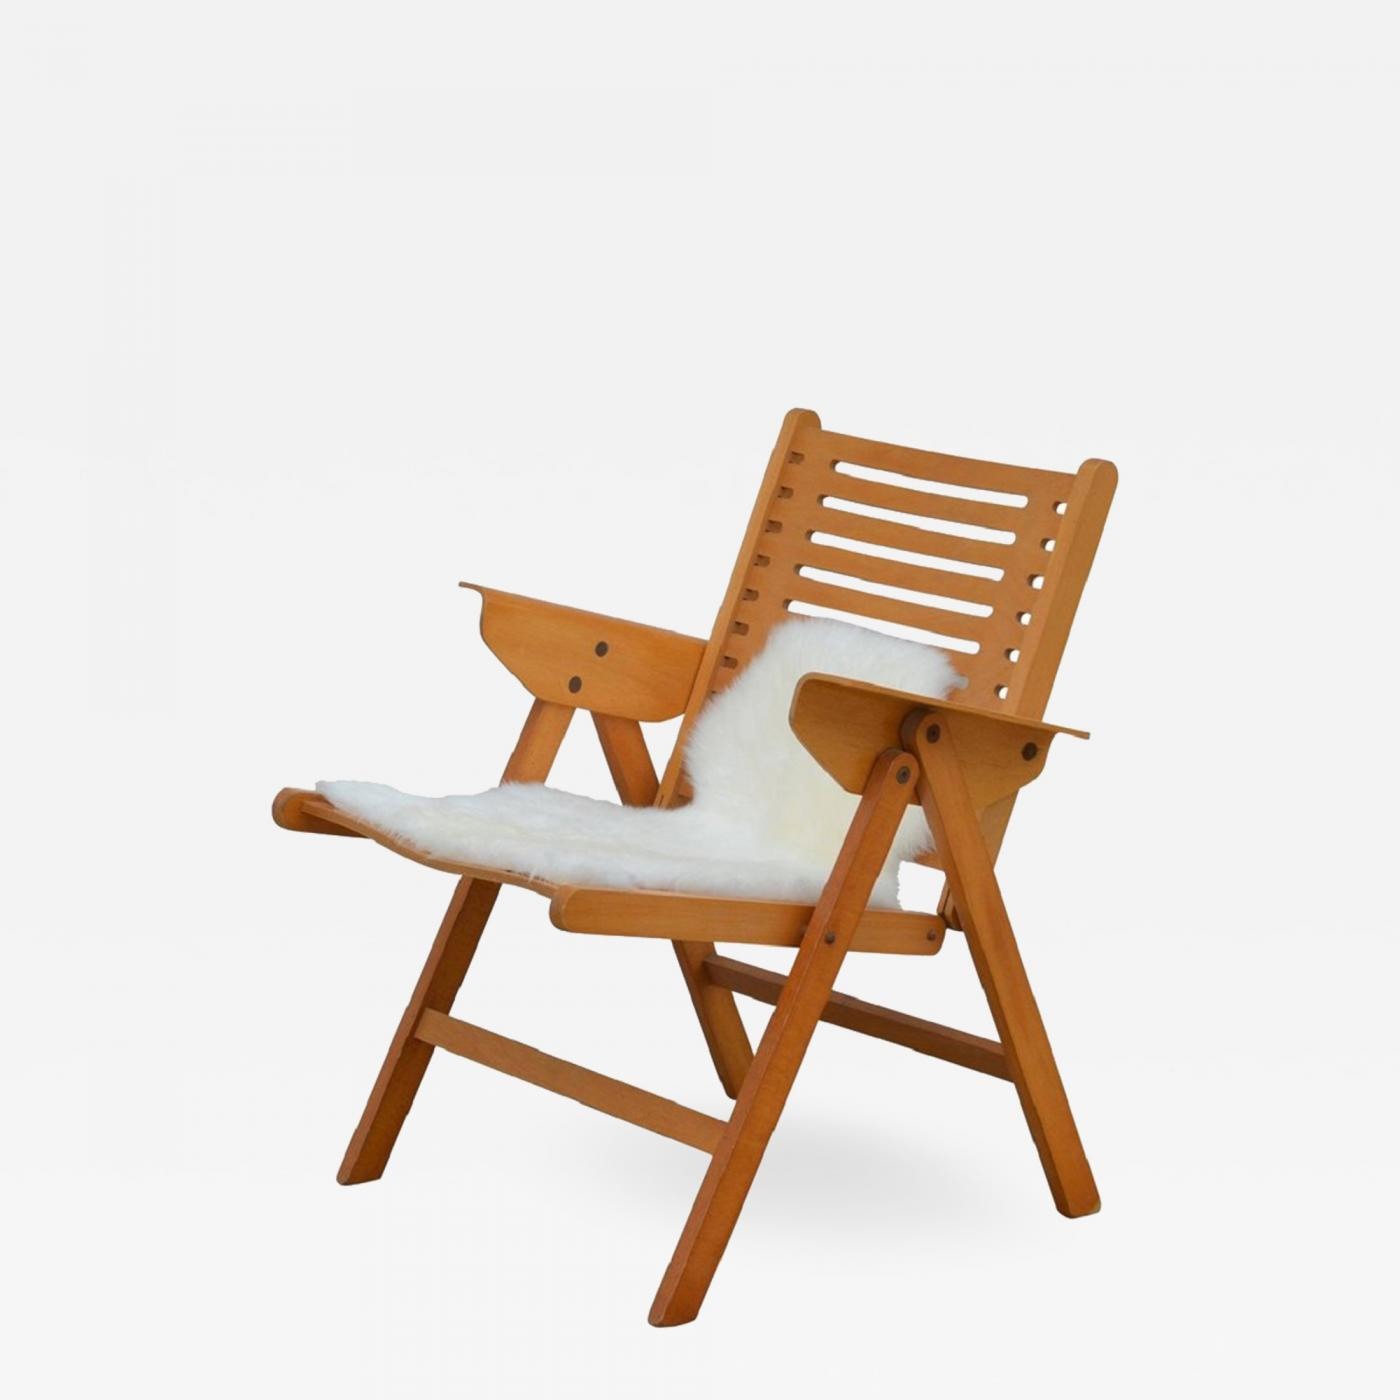 Phenomenal Niko Kralj Iconic Vintage Folding Rex Lounge Chair By Niko Kralj Theyellowbook Wood Chair Design Ideas Theyellowbookinfo